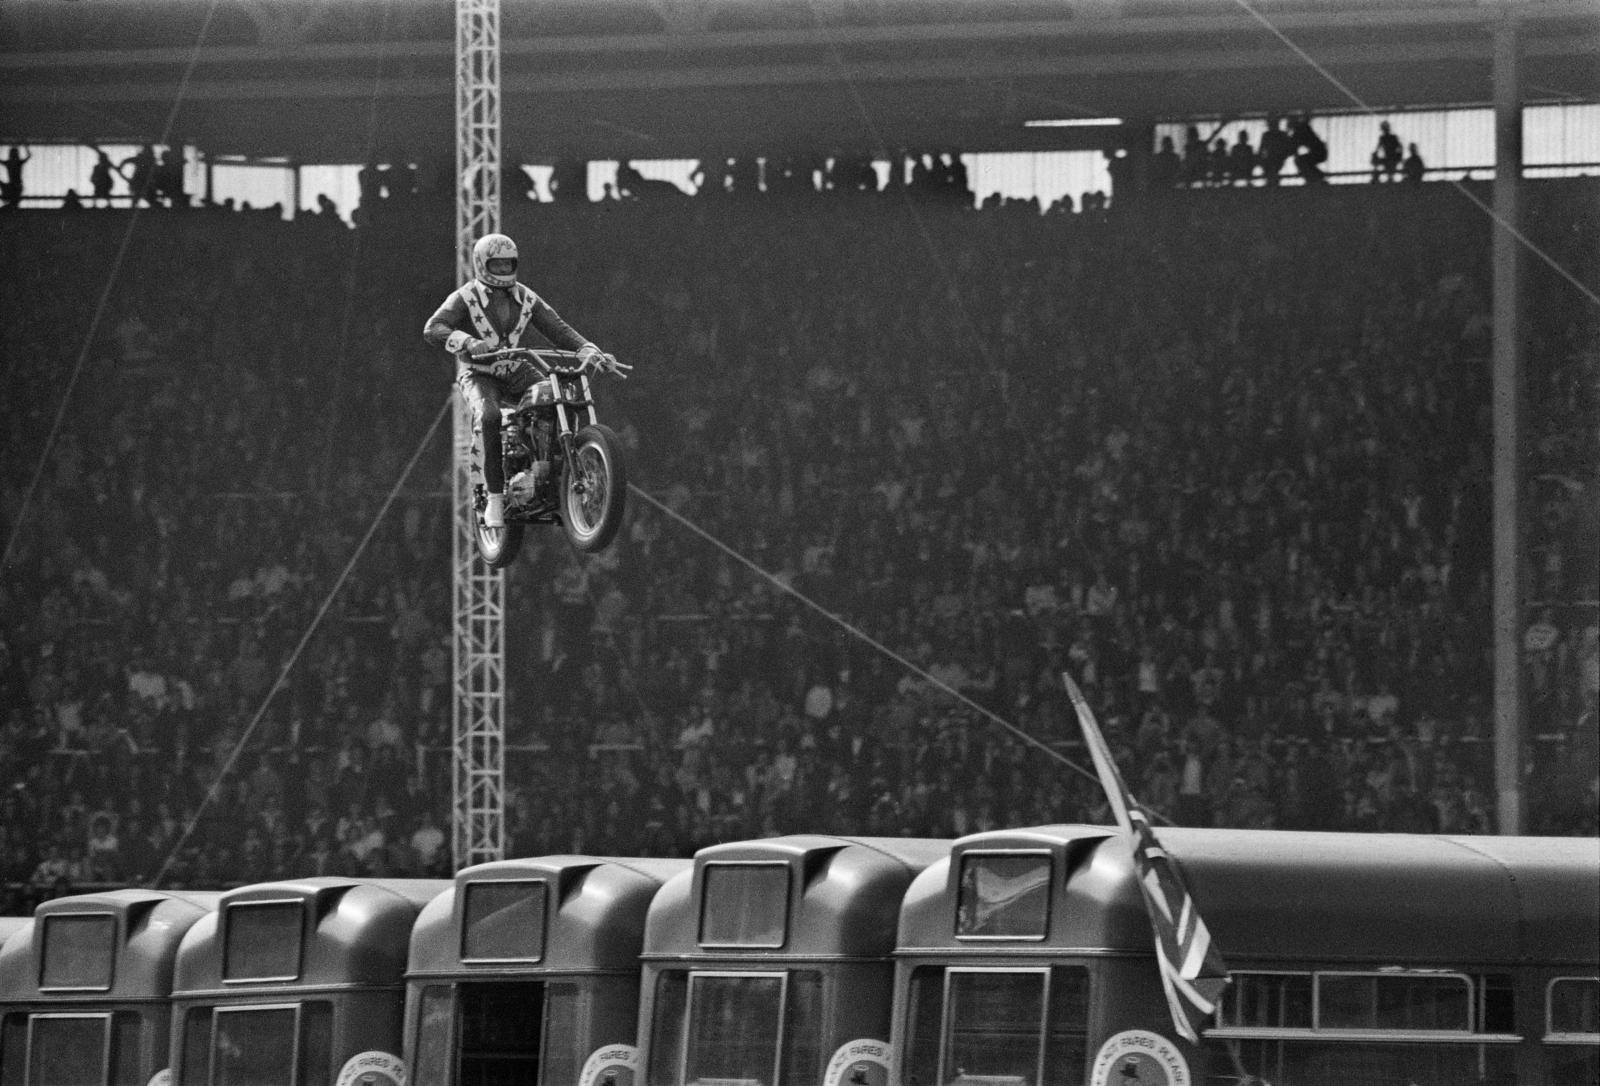 Evel Knievel's Wembley Jump